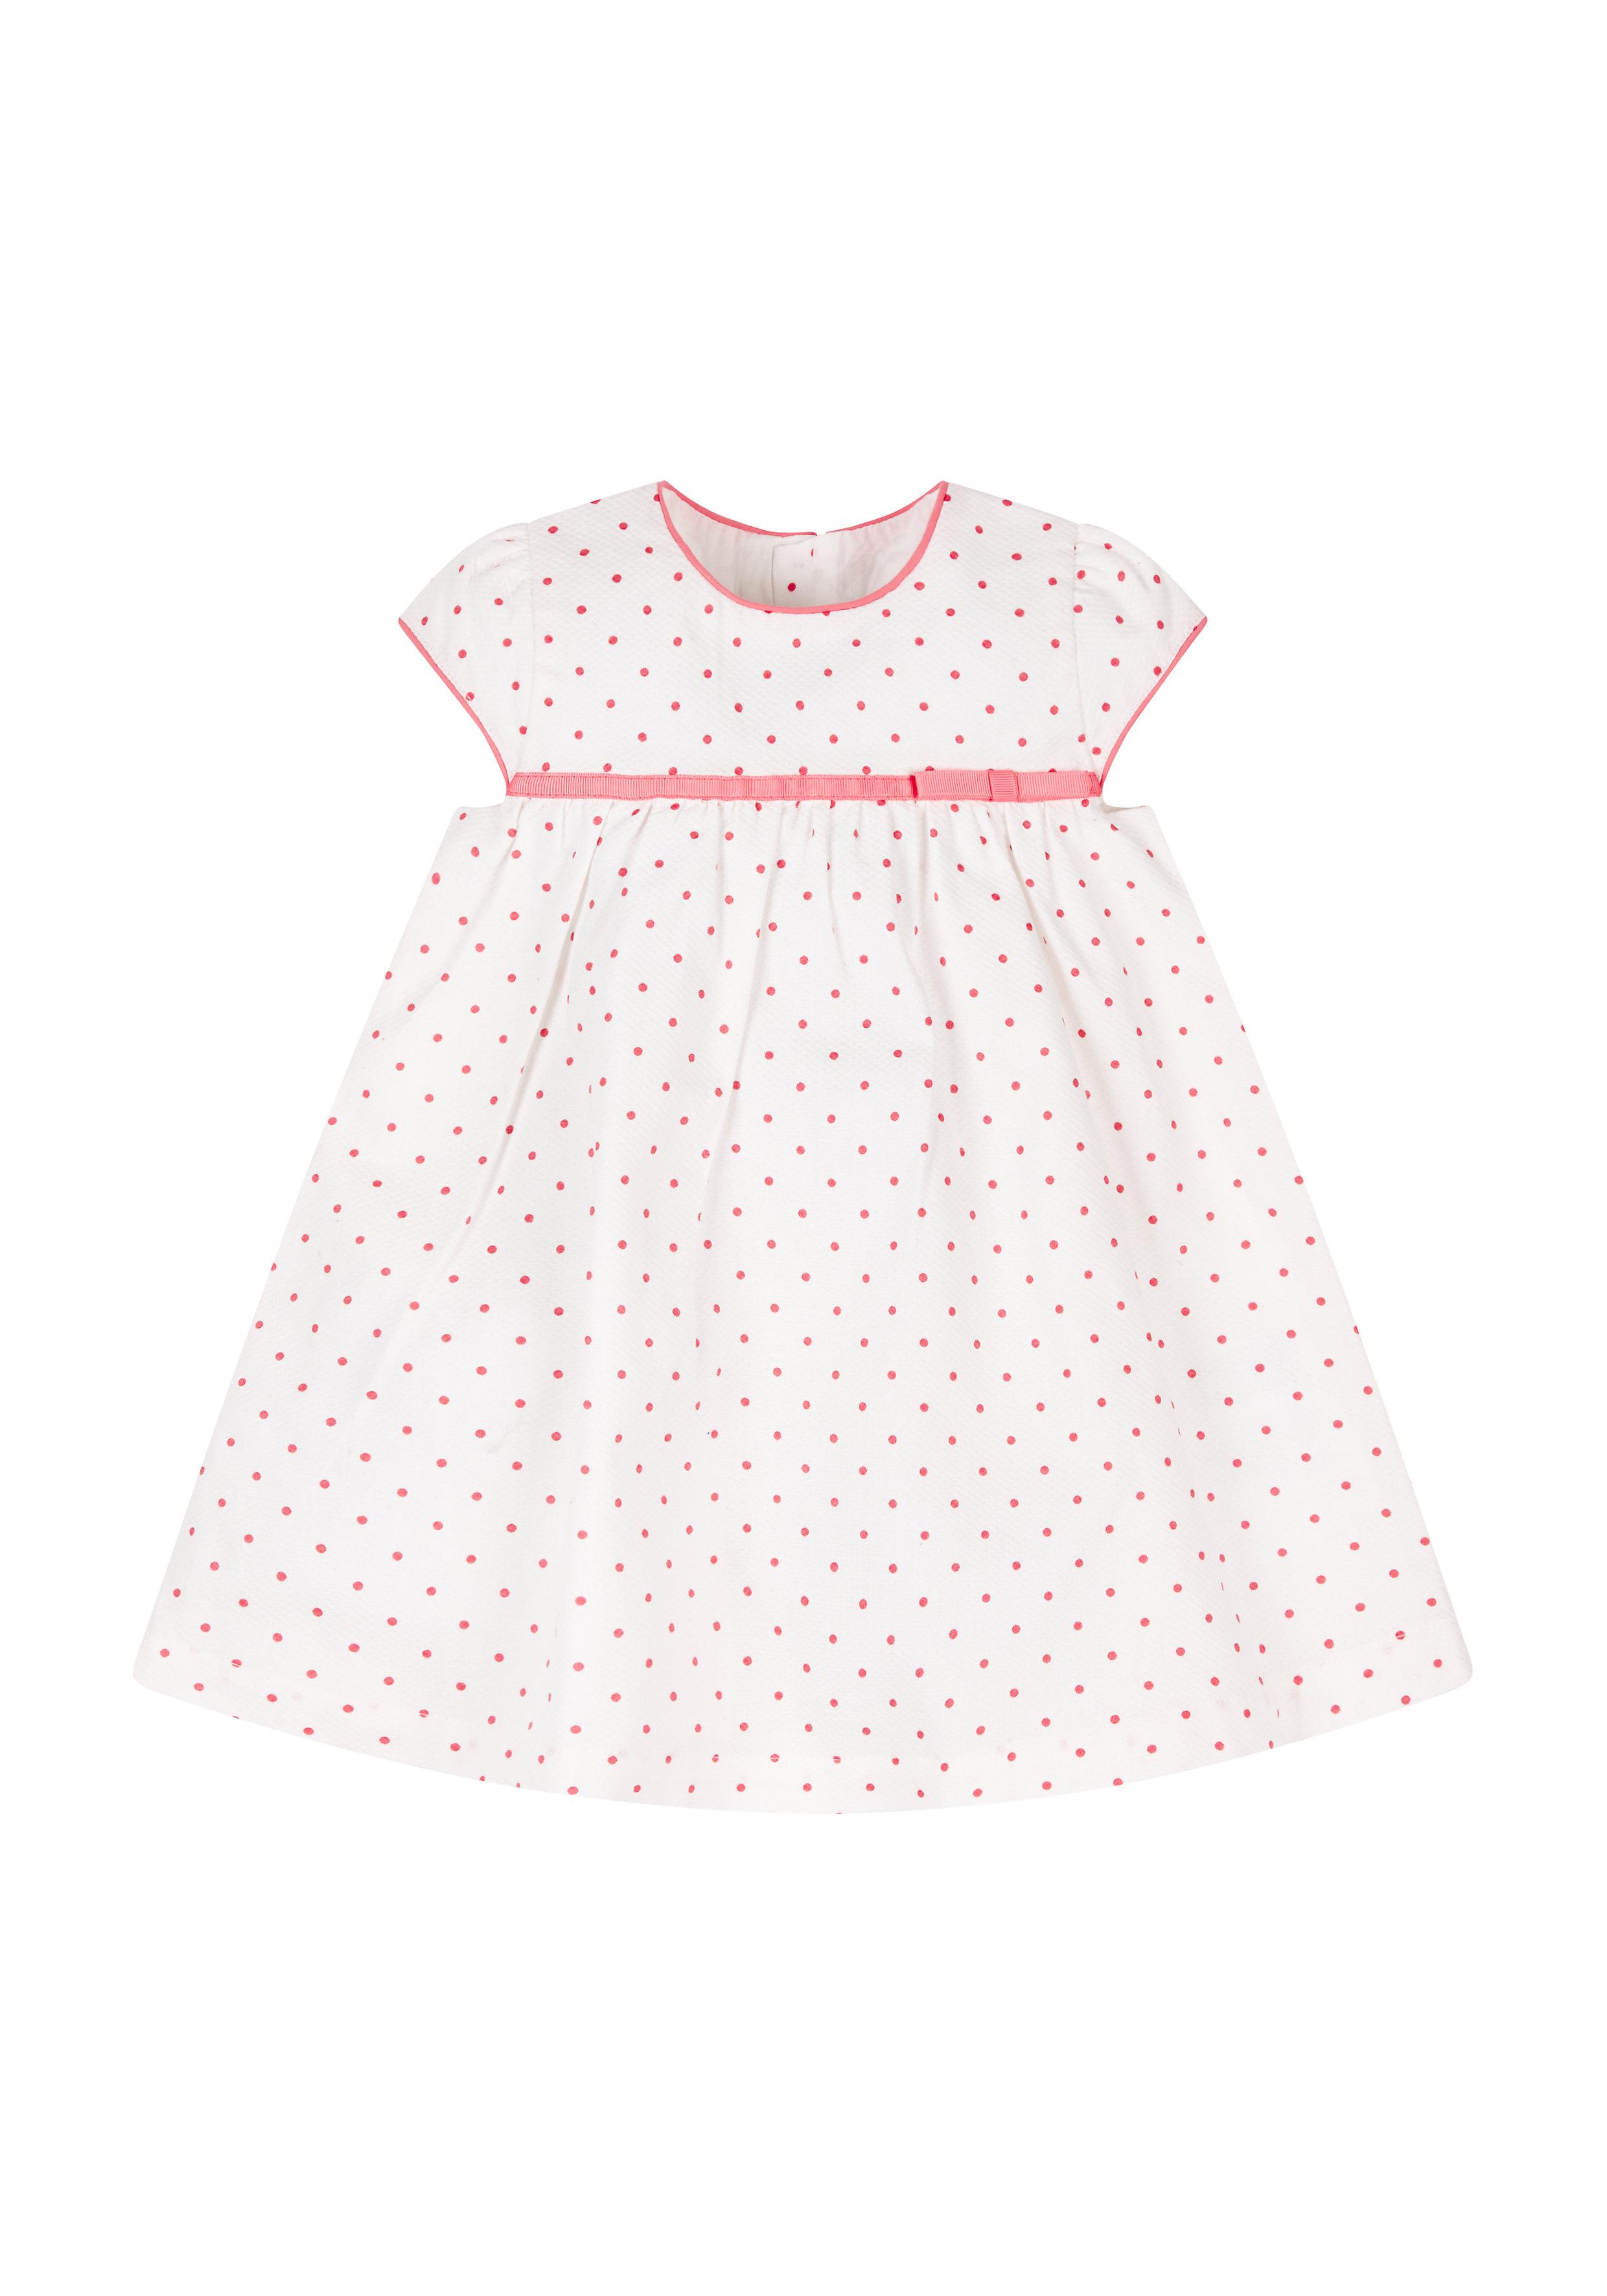 Mothercare | Girls Half Sleeves Dress Polka Dot Print - White